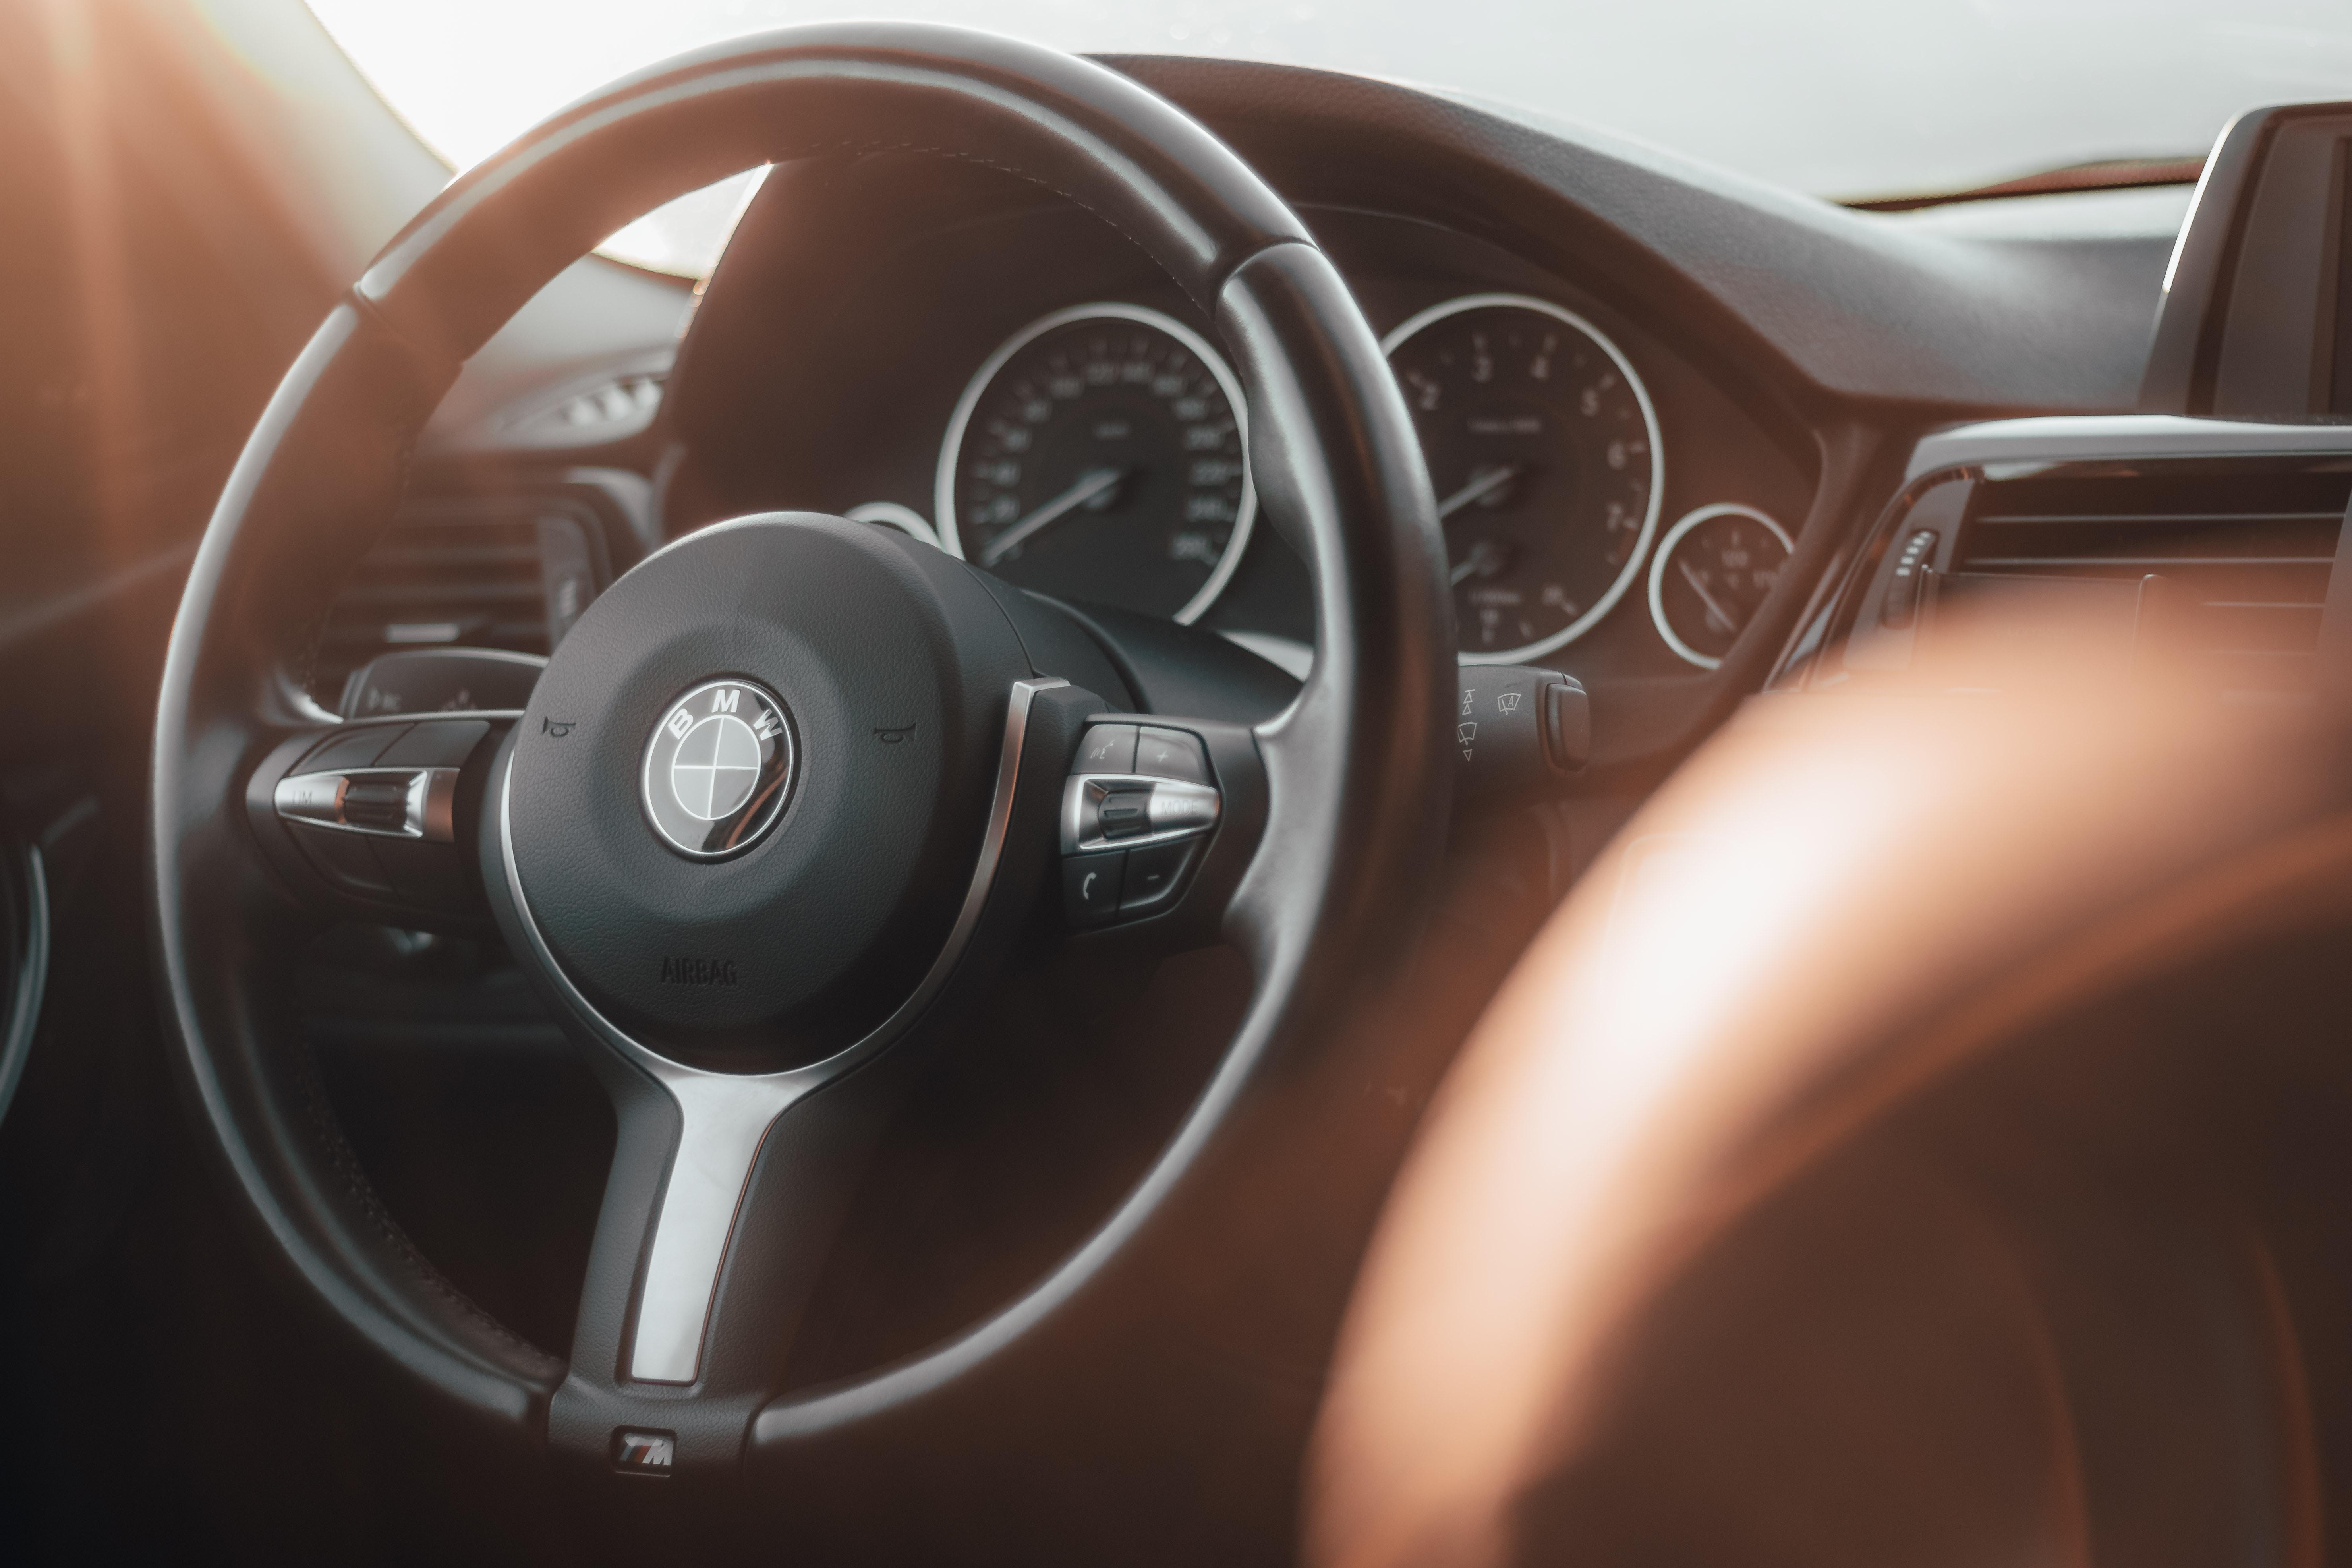 BMW 320i F30 steering wheel